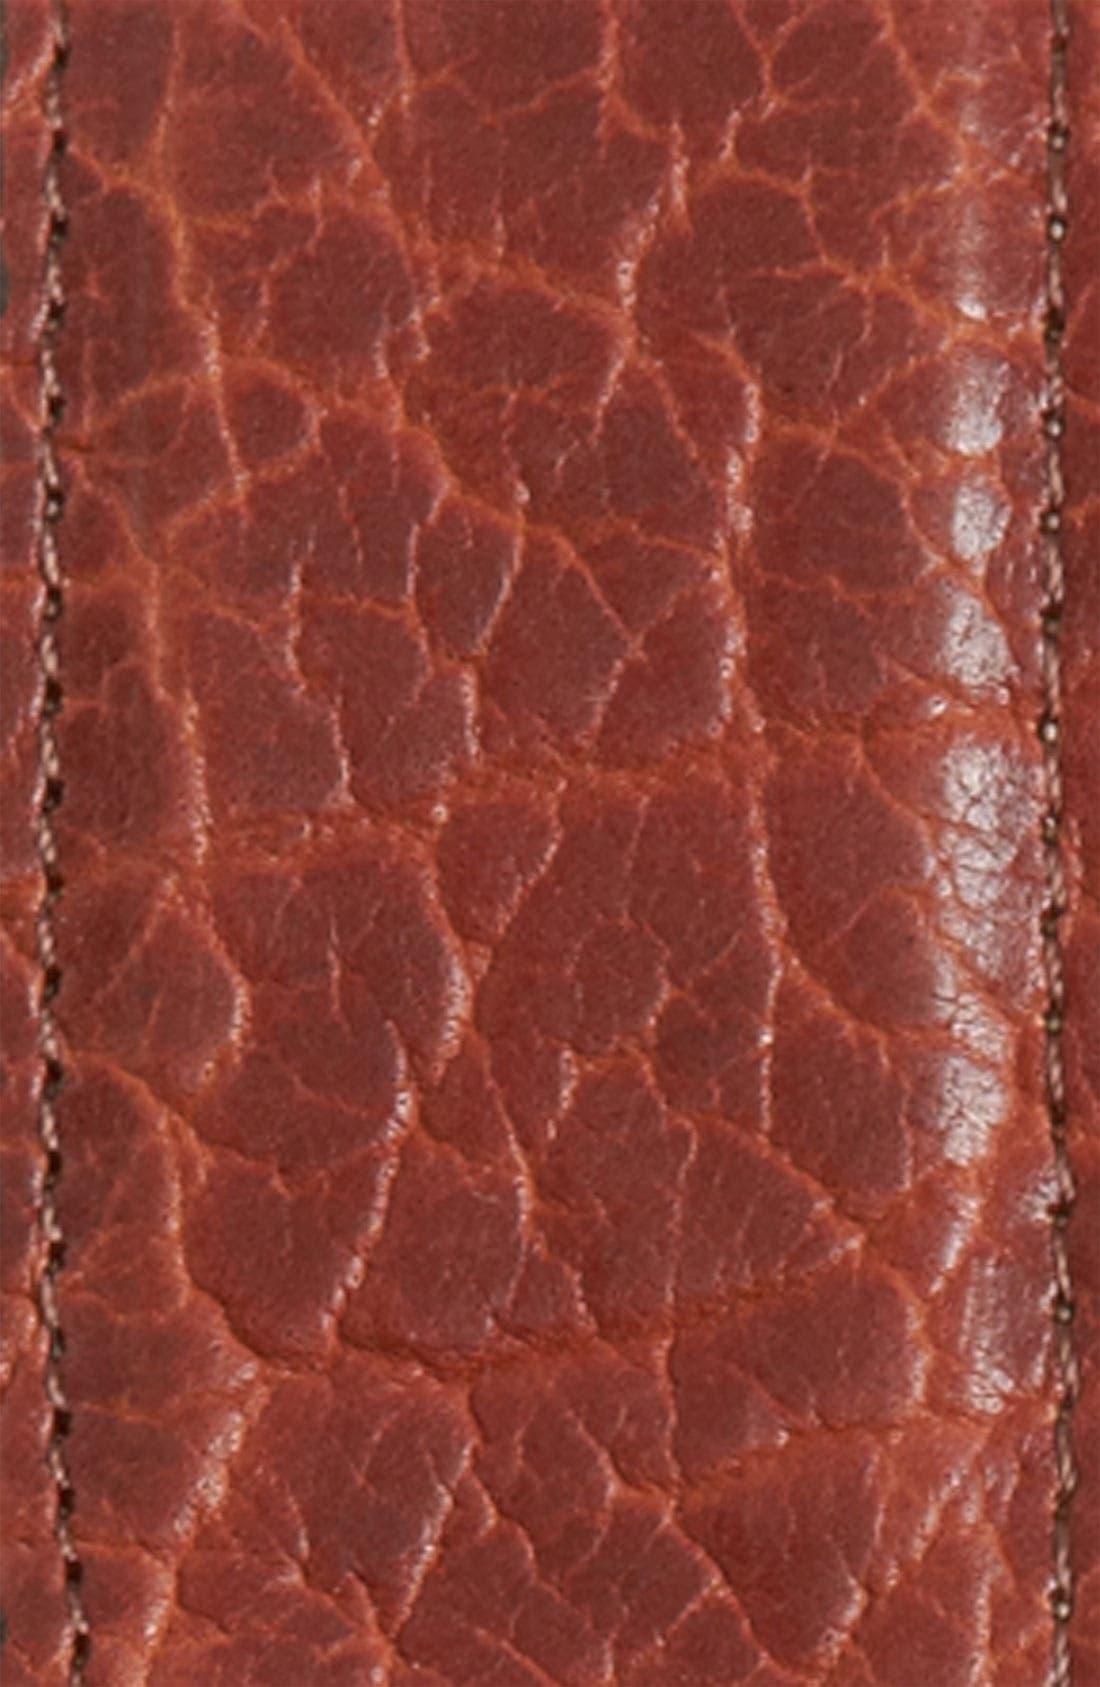 Alternate Image 2  - Trafalgar 'Walsh' Bison Leather Belt